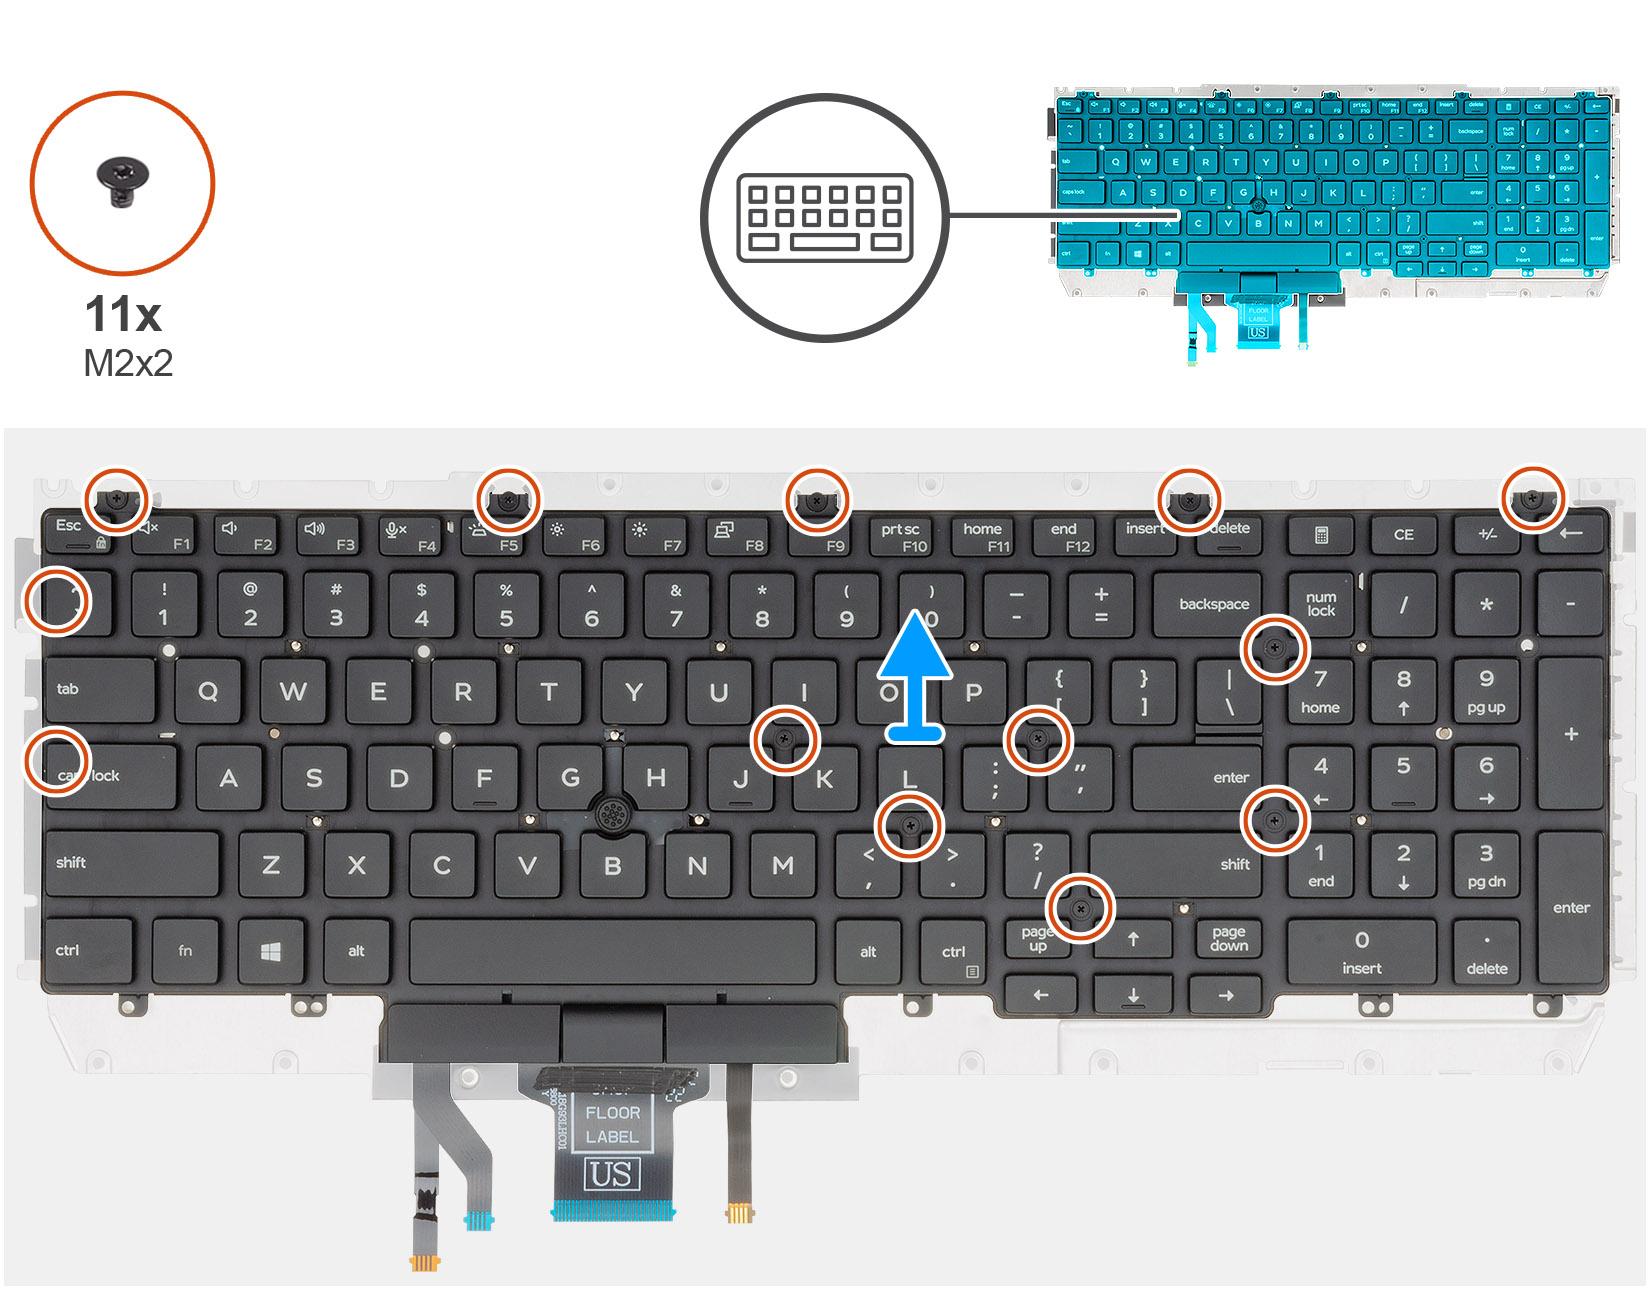 Removing the keyboard bracket